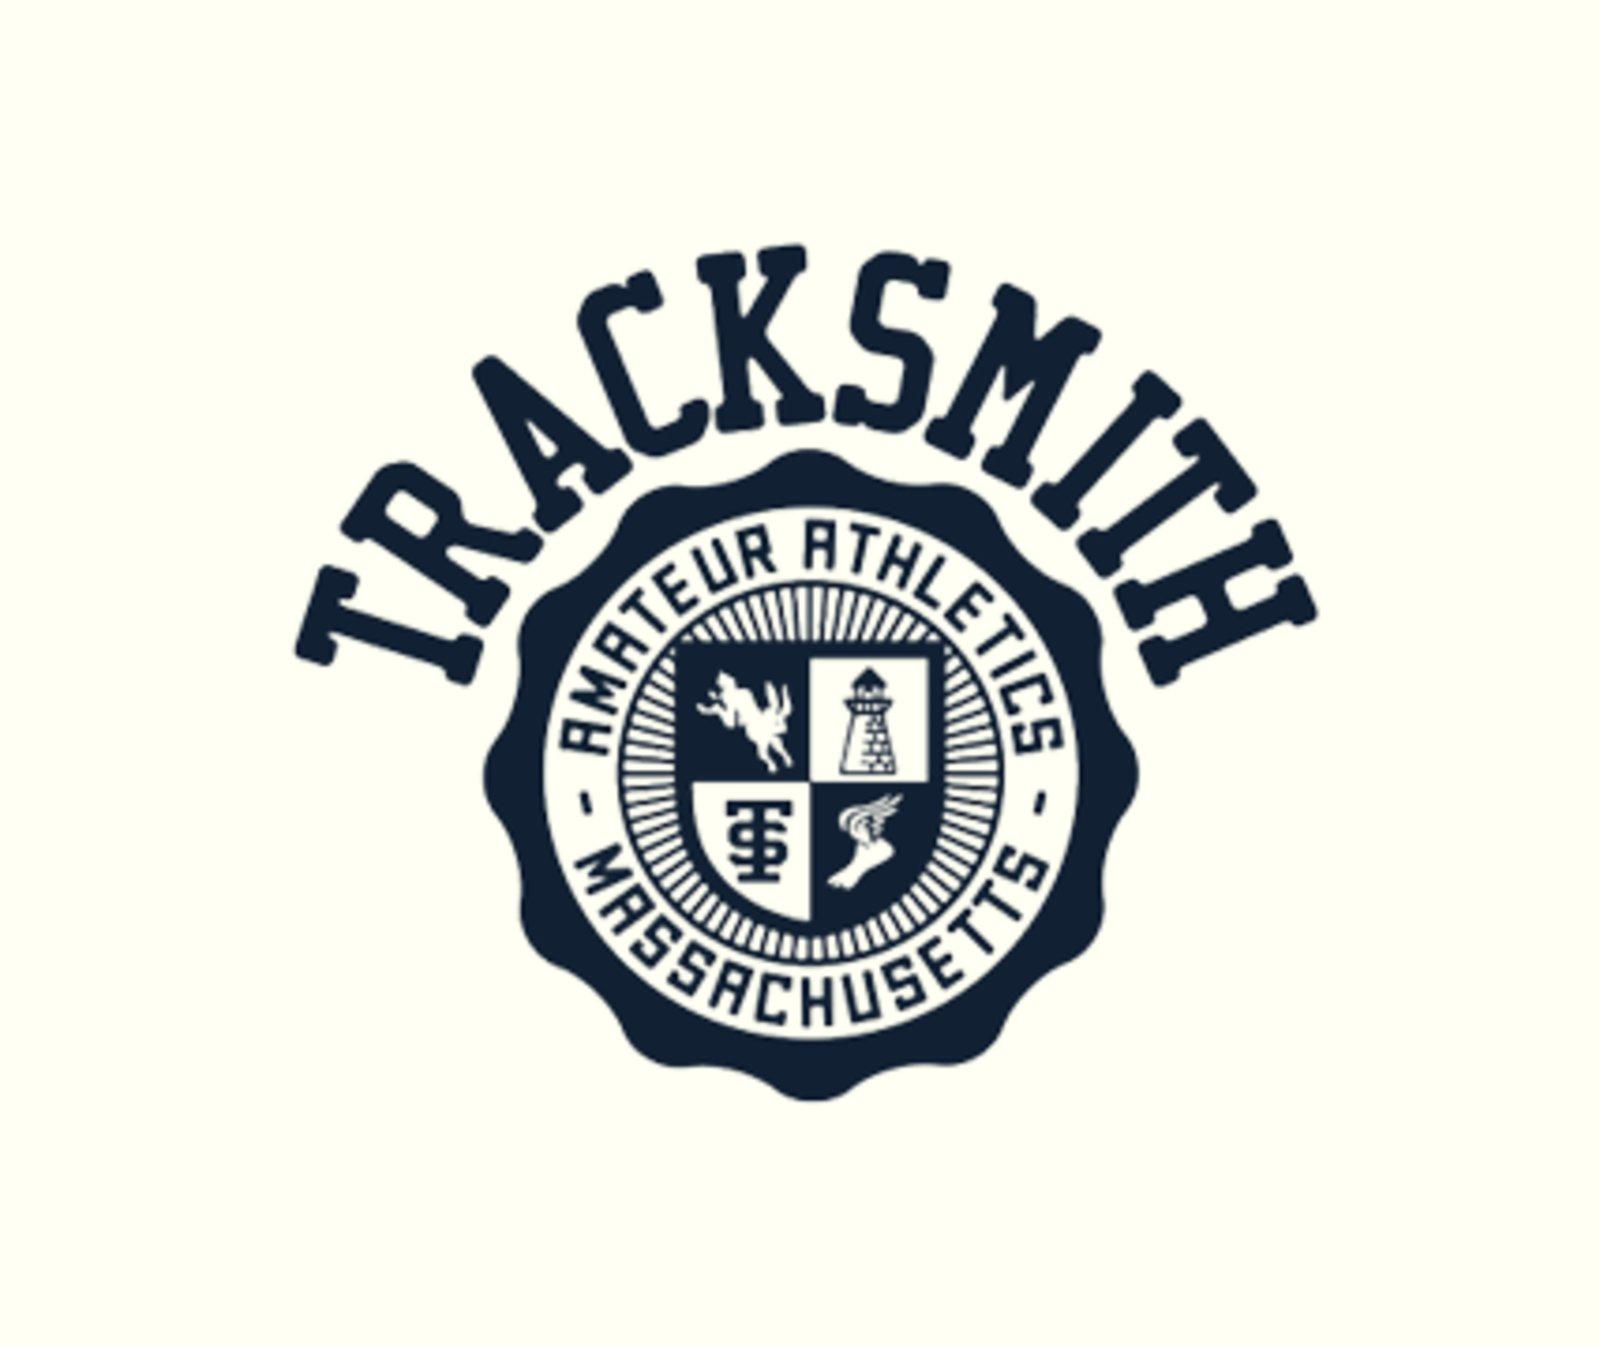 Tracksmith brand logo - Tracksmith Amateur Athletics